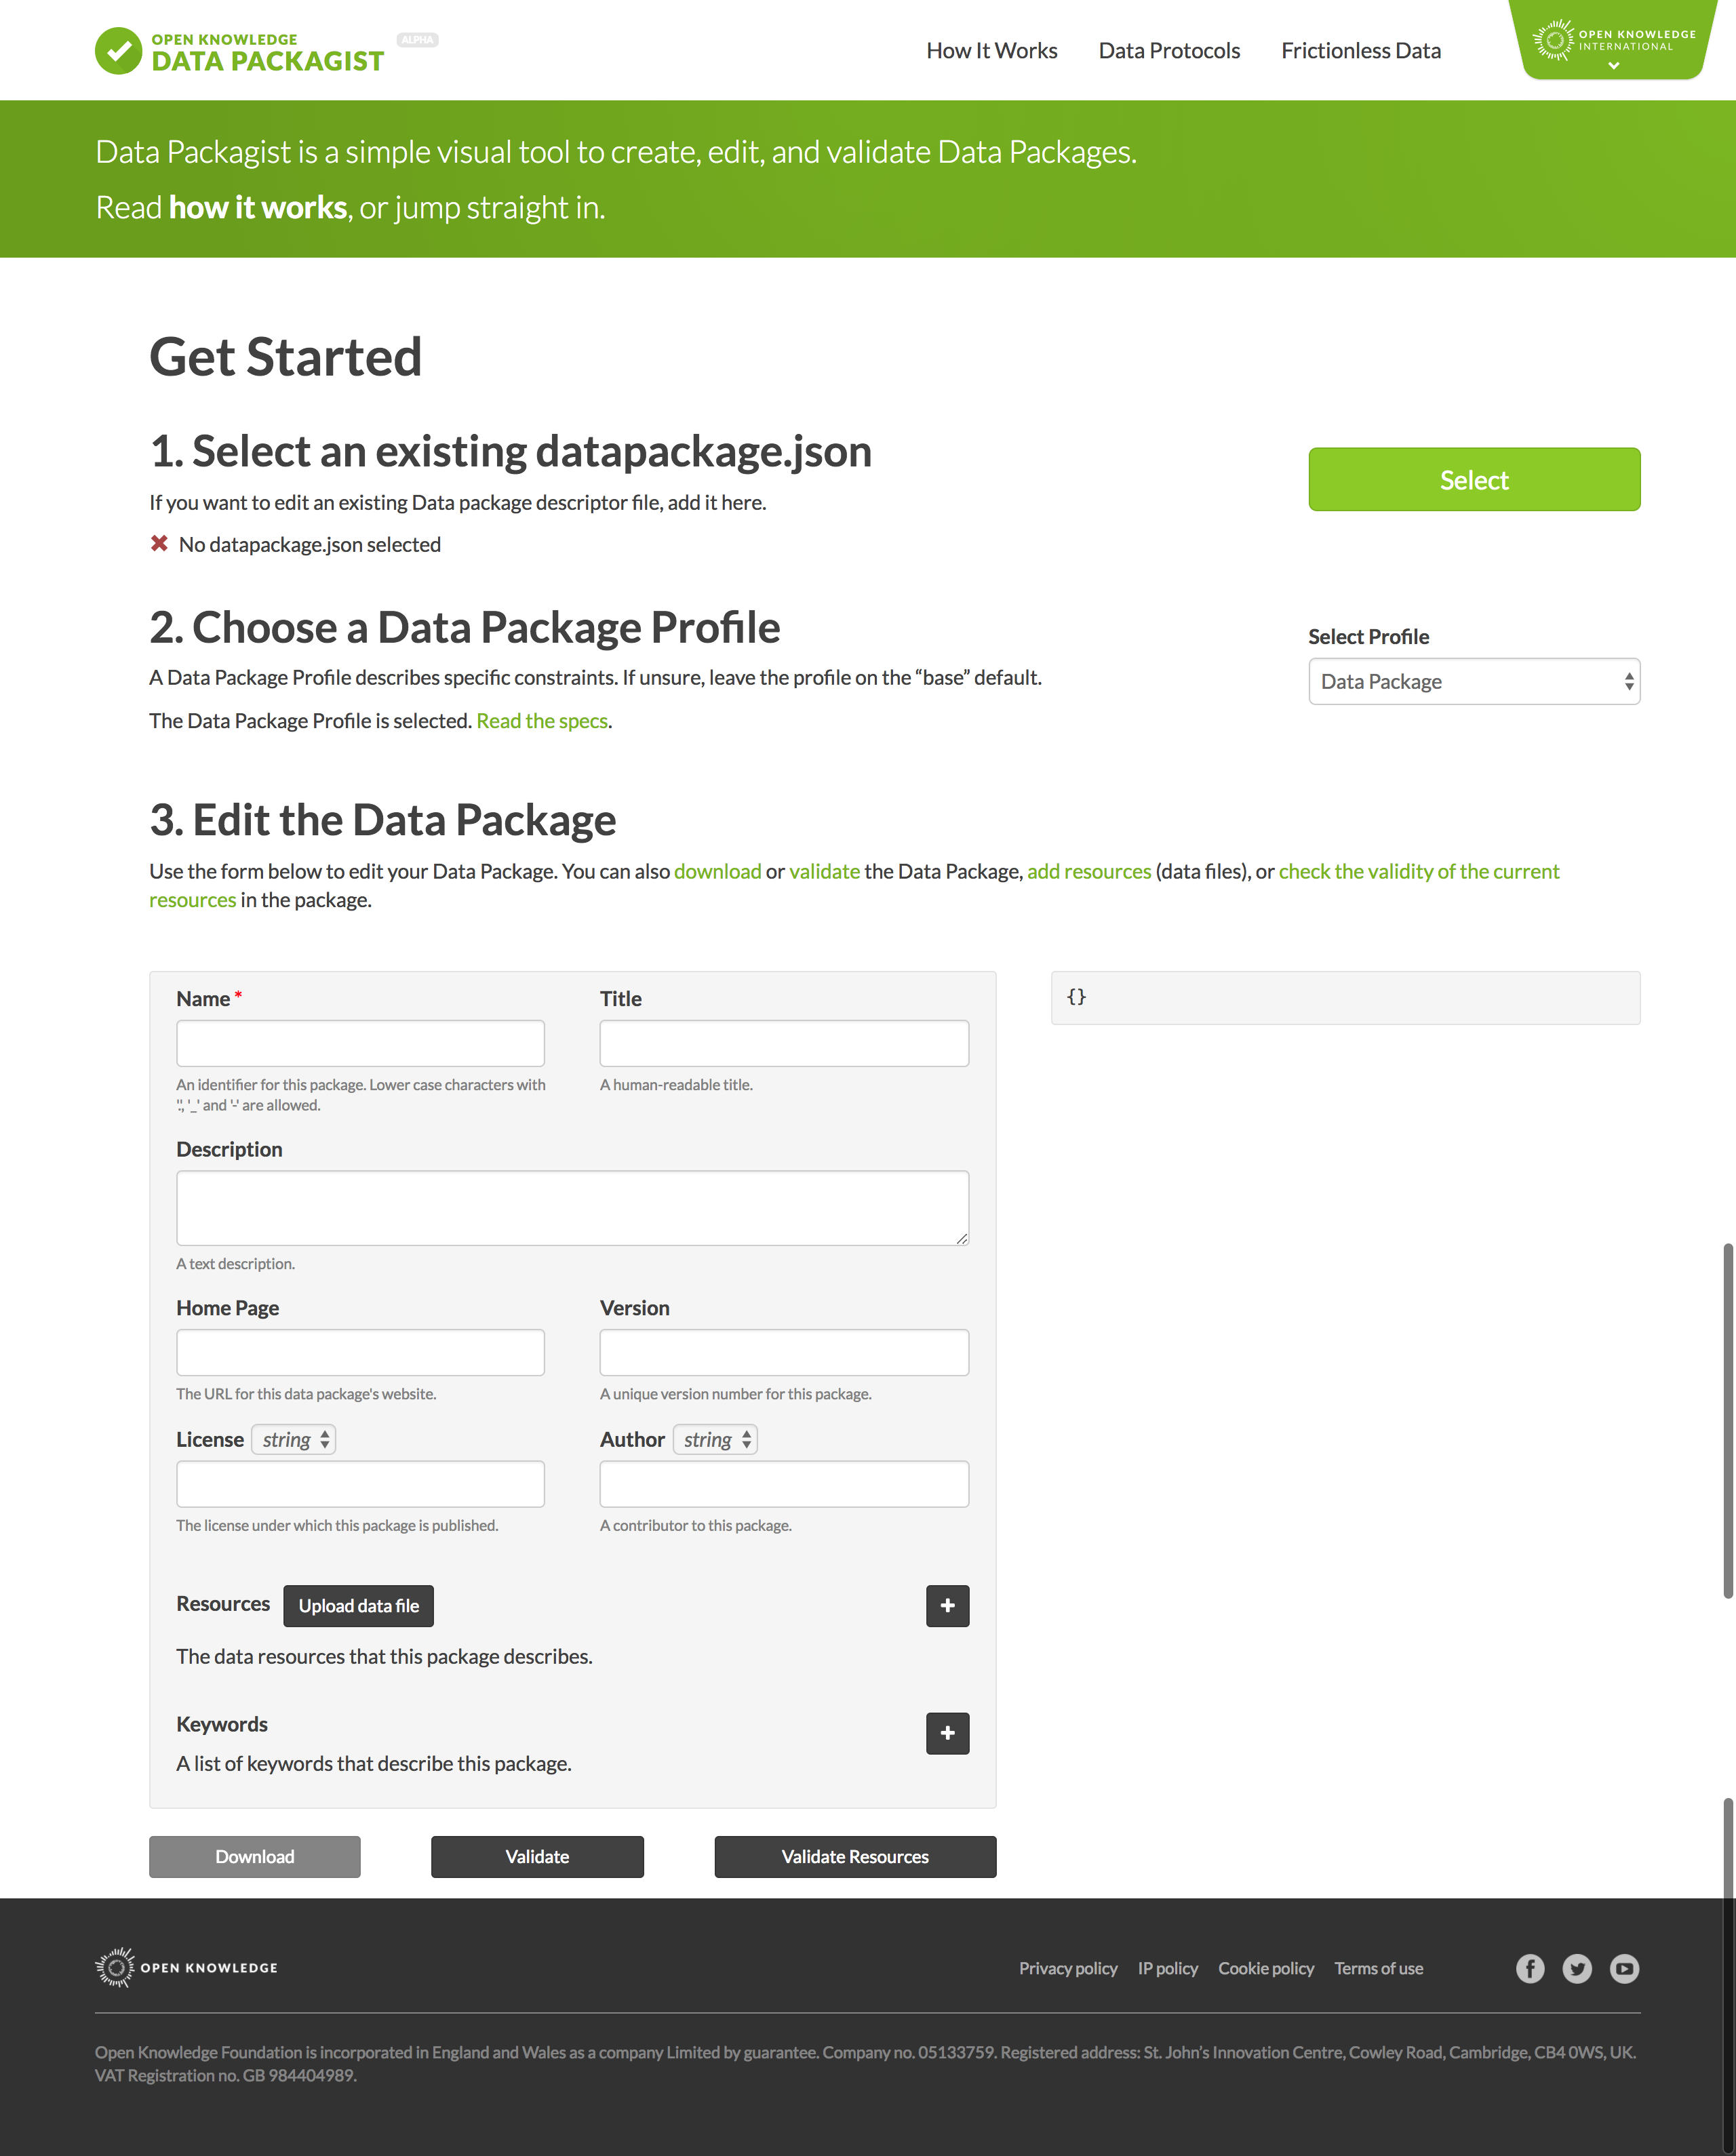 screen grab of the Data Packagist app